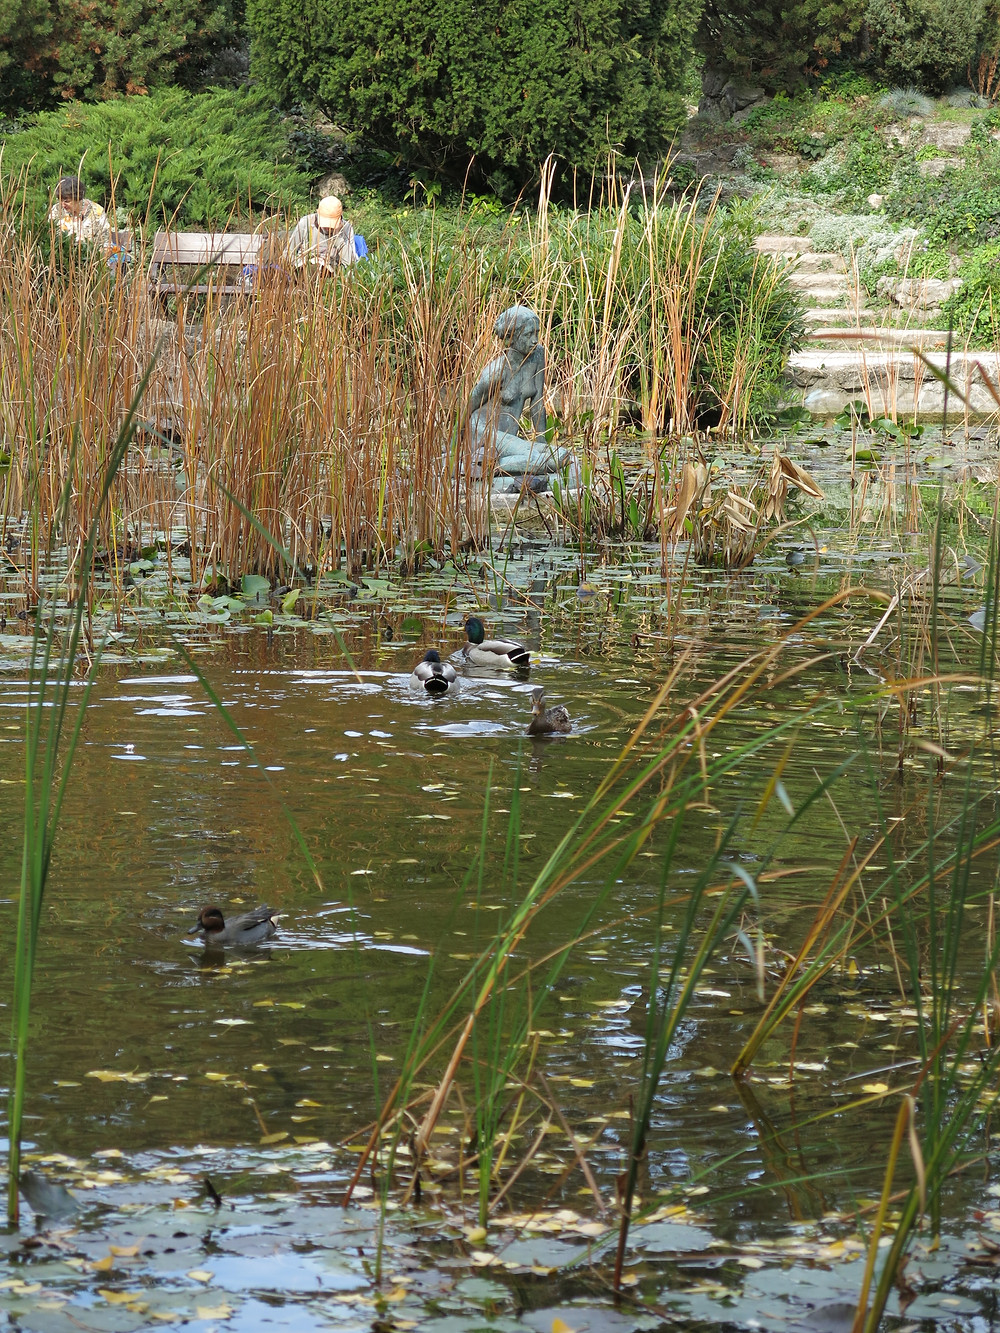 布達佩斯 Margaret Island ,湖中雕塑